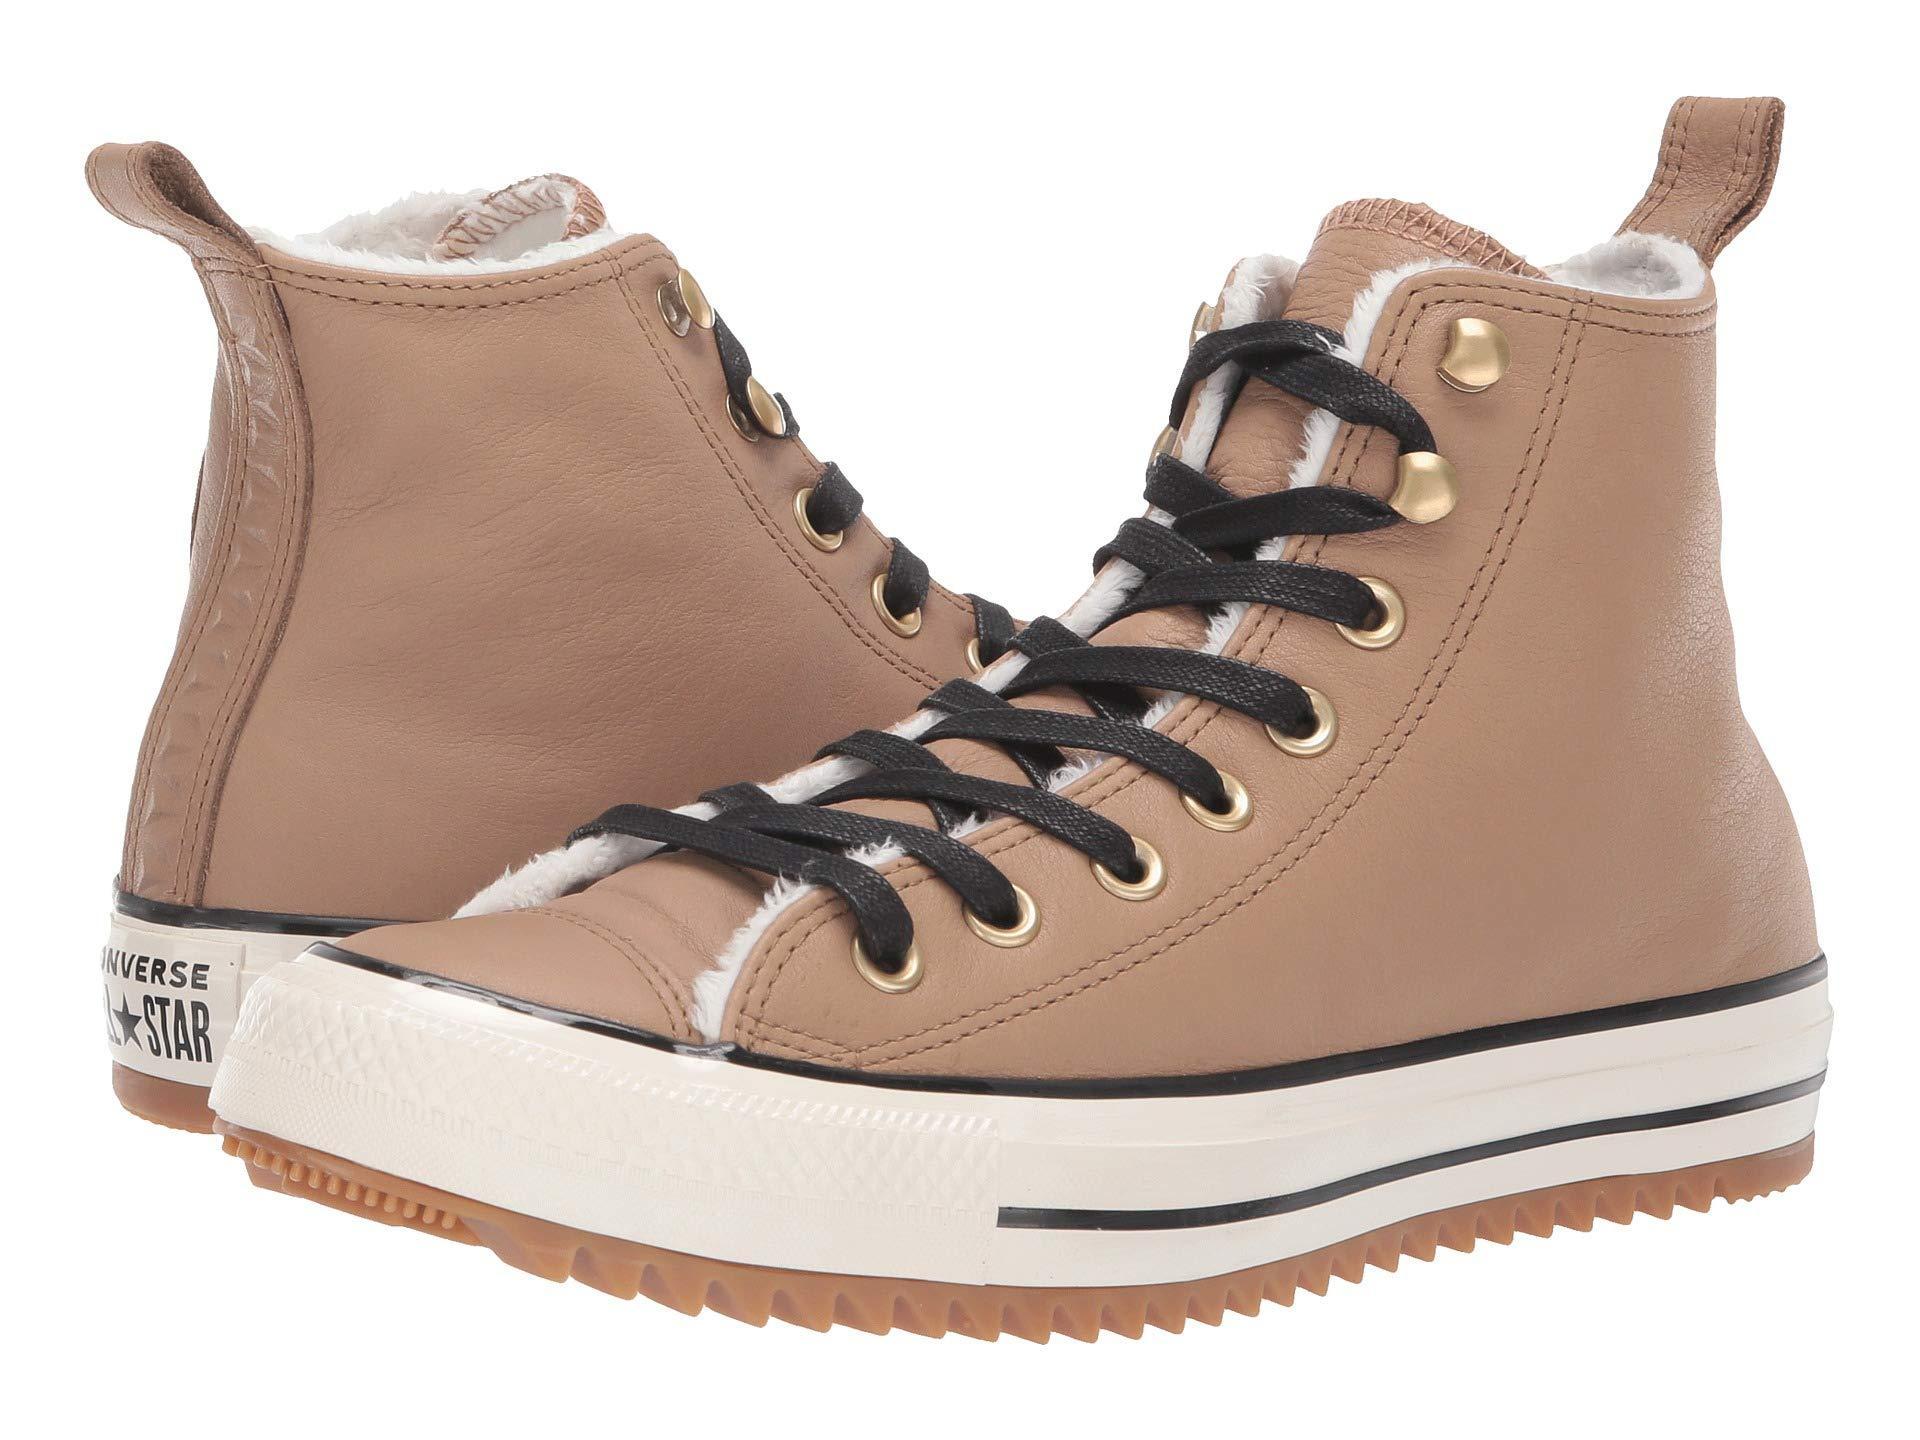 e58a6f6025da Lyst - Converse Chuck Taylor All Star Hiker Boot - Hi - Save 27%